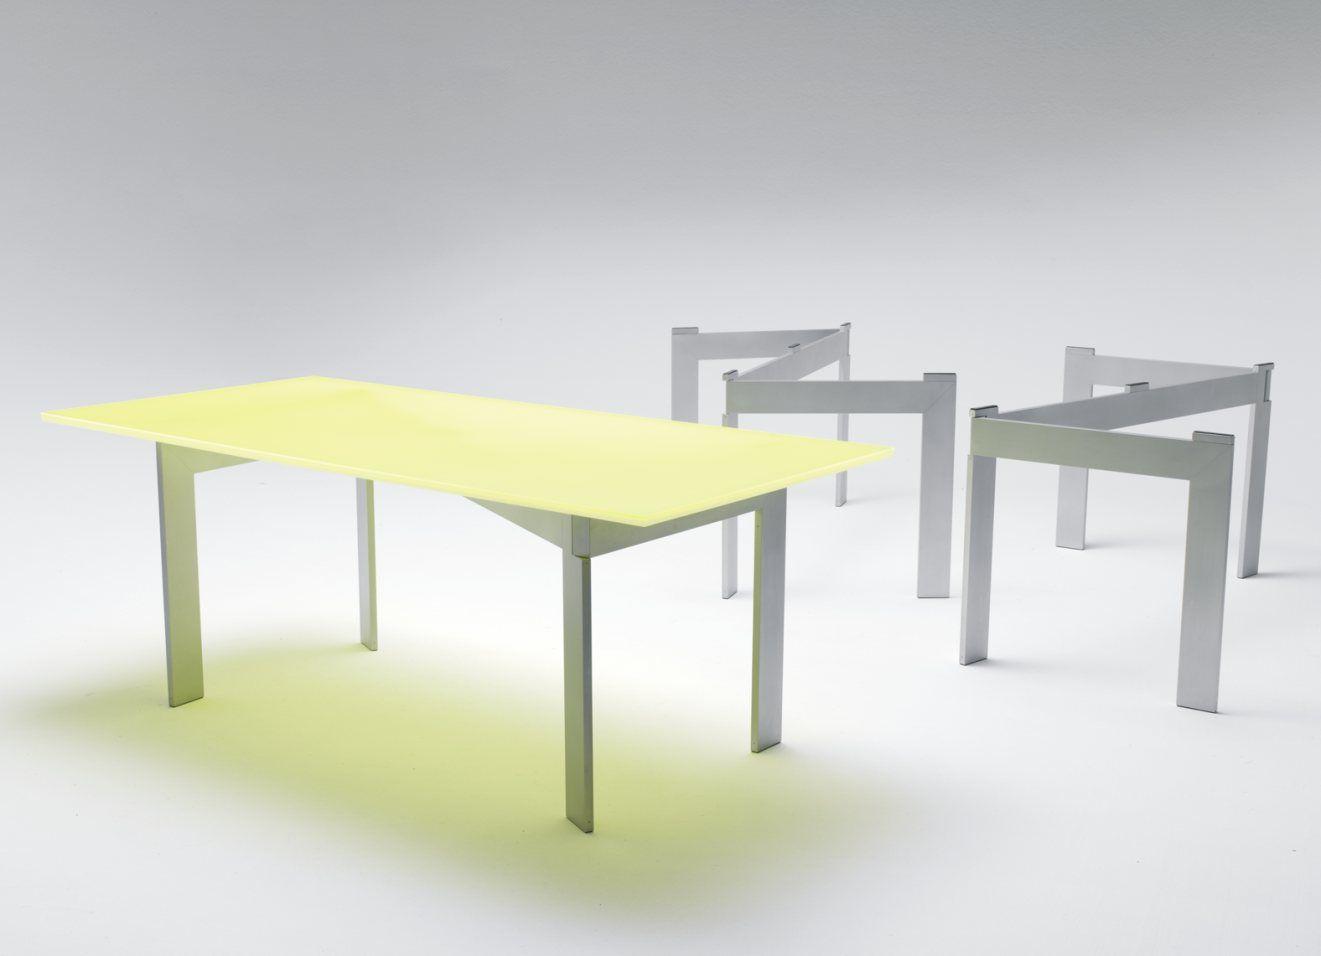 ZENO Design by Oehring + Lux Studio production www.oehringlux.de